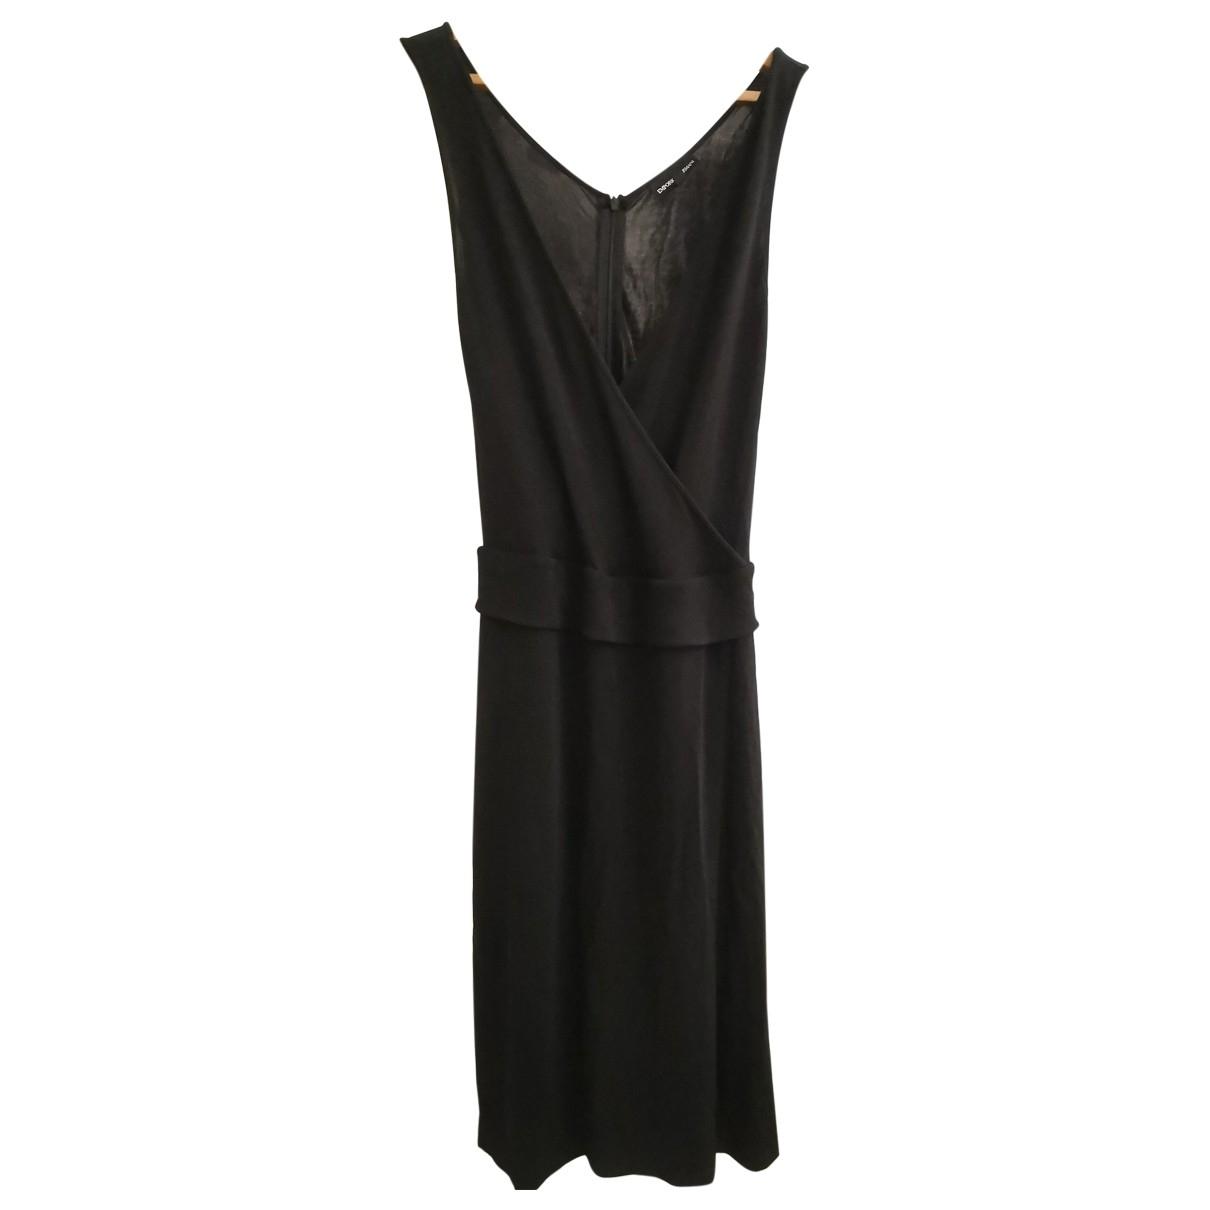 Emporio Armani \N Black dress for Women 42 IT